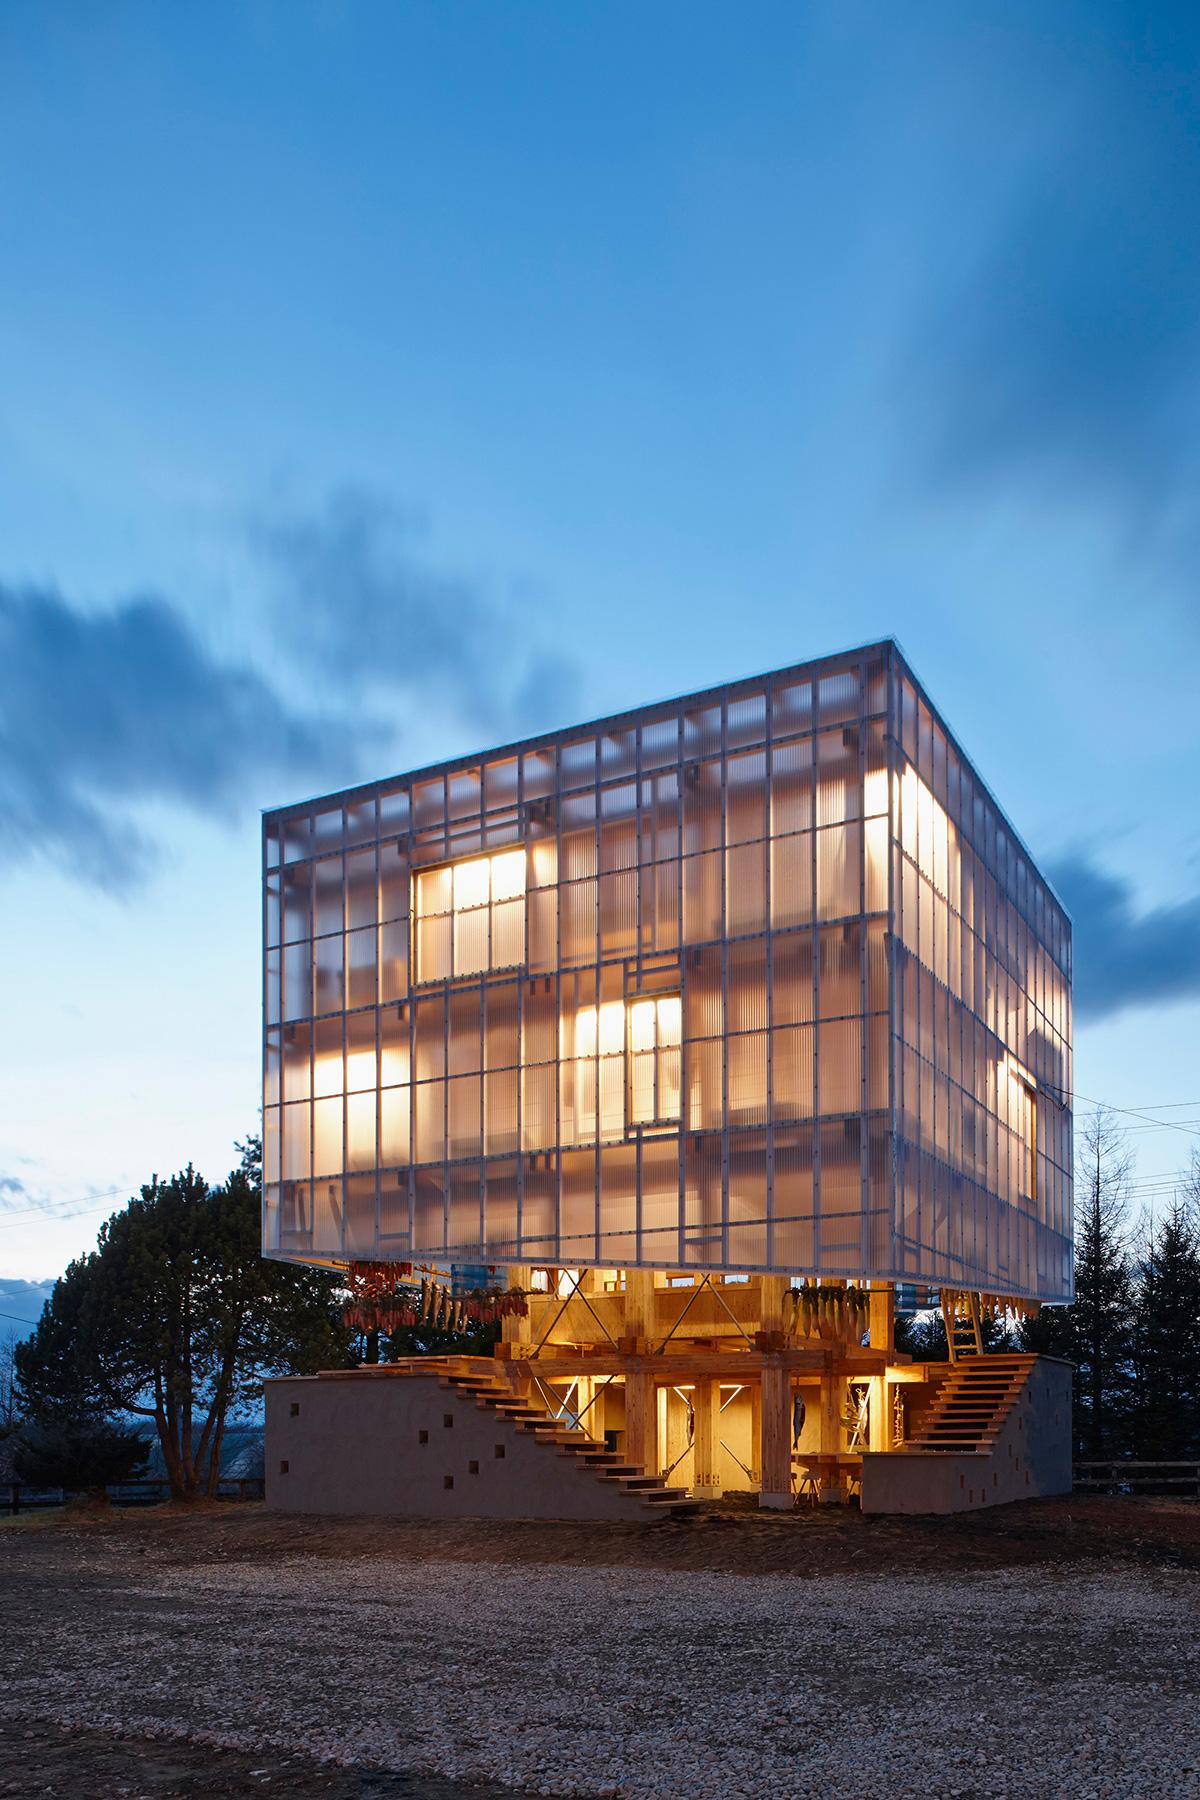 Nest We Grow / College of Environmental Design & Kengo Kuma & Associates (29)